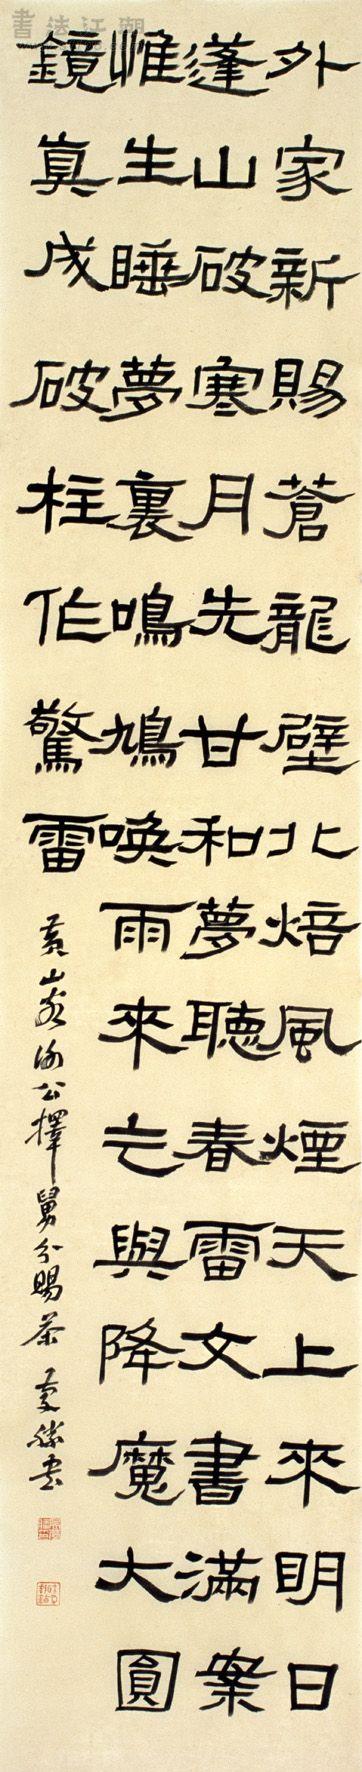 Scan001副本.jpg